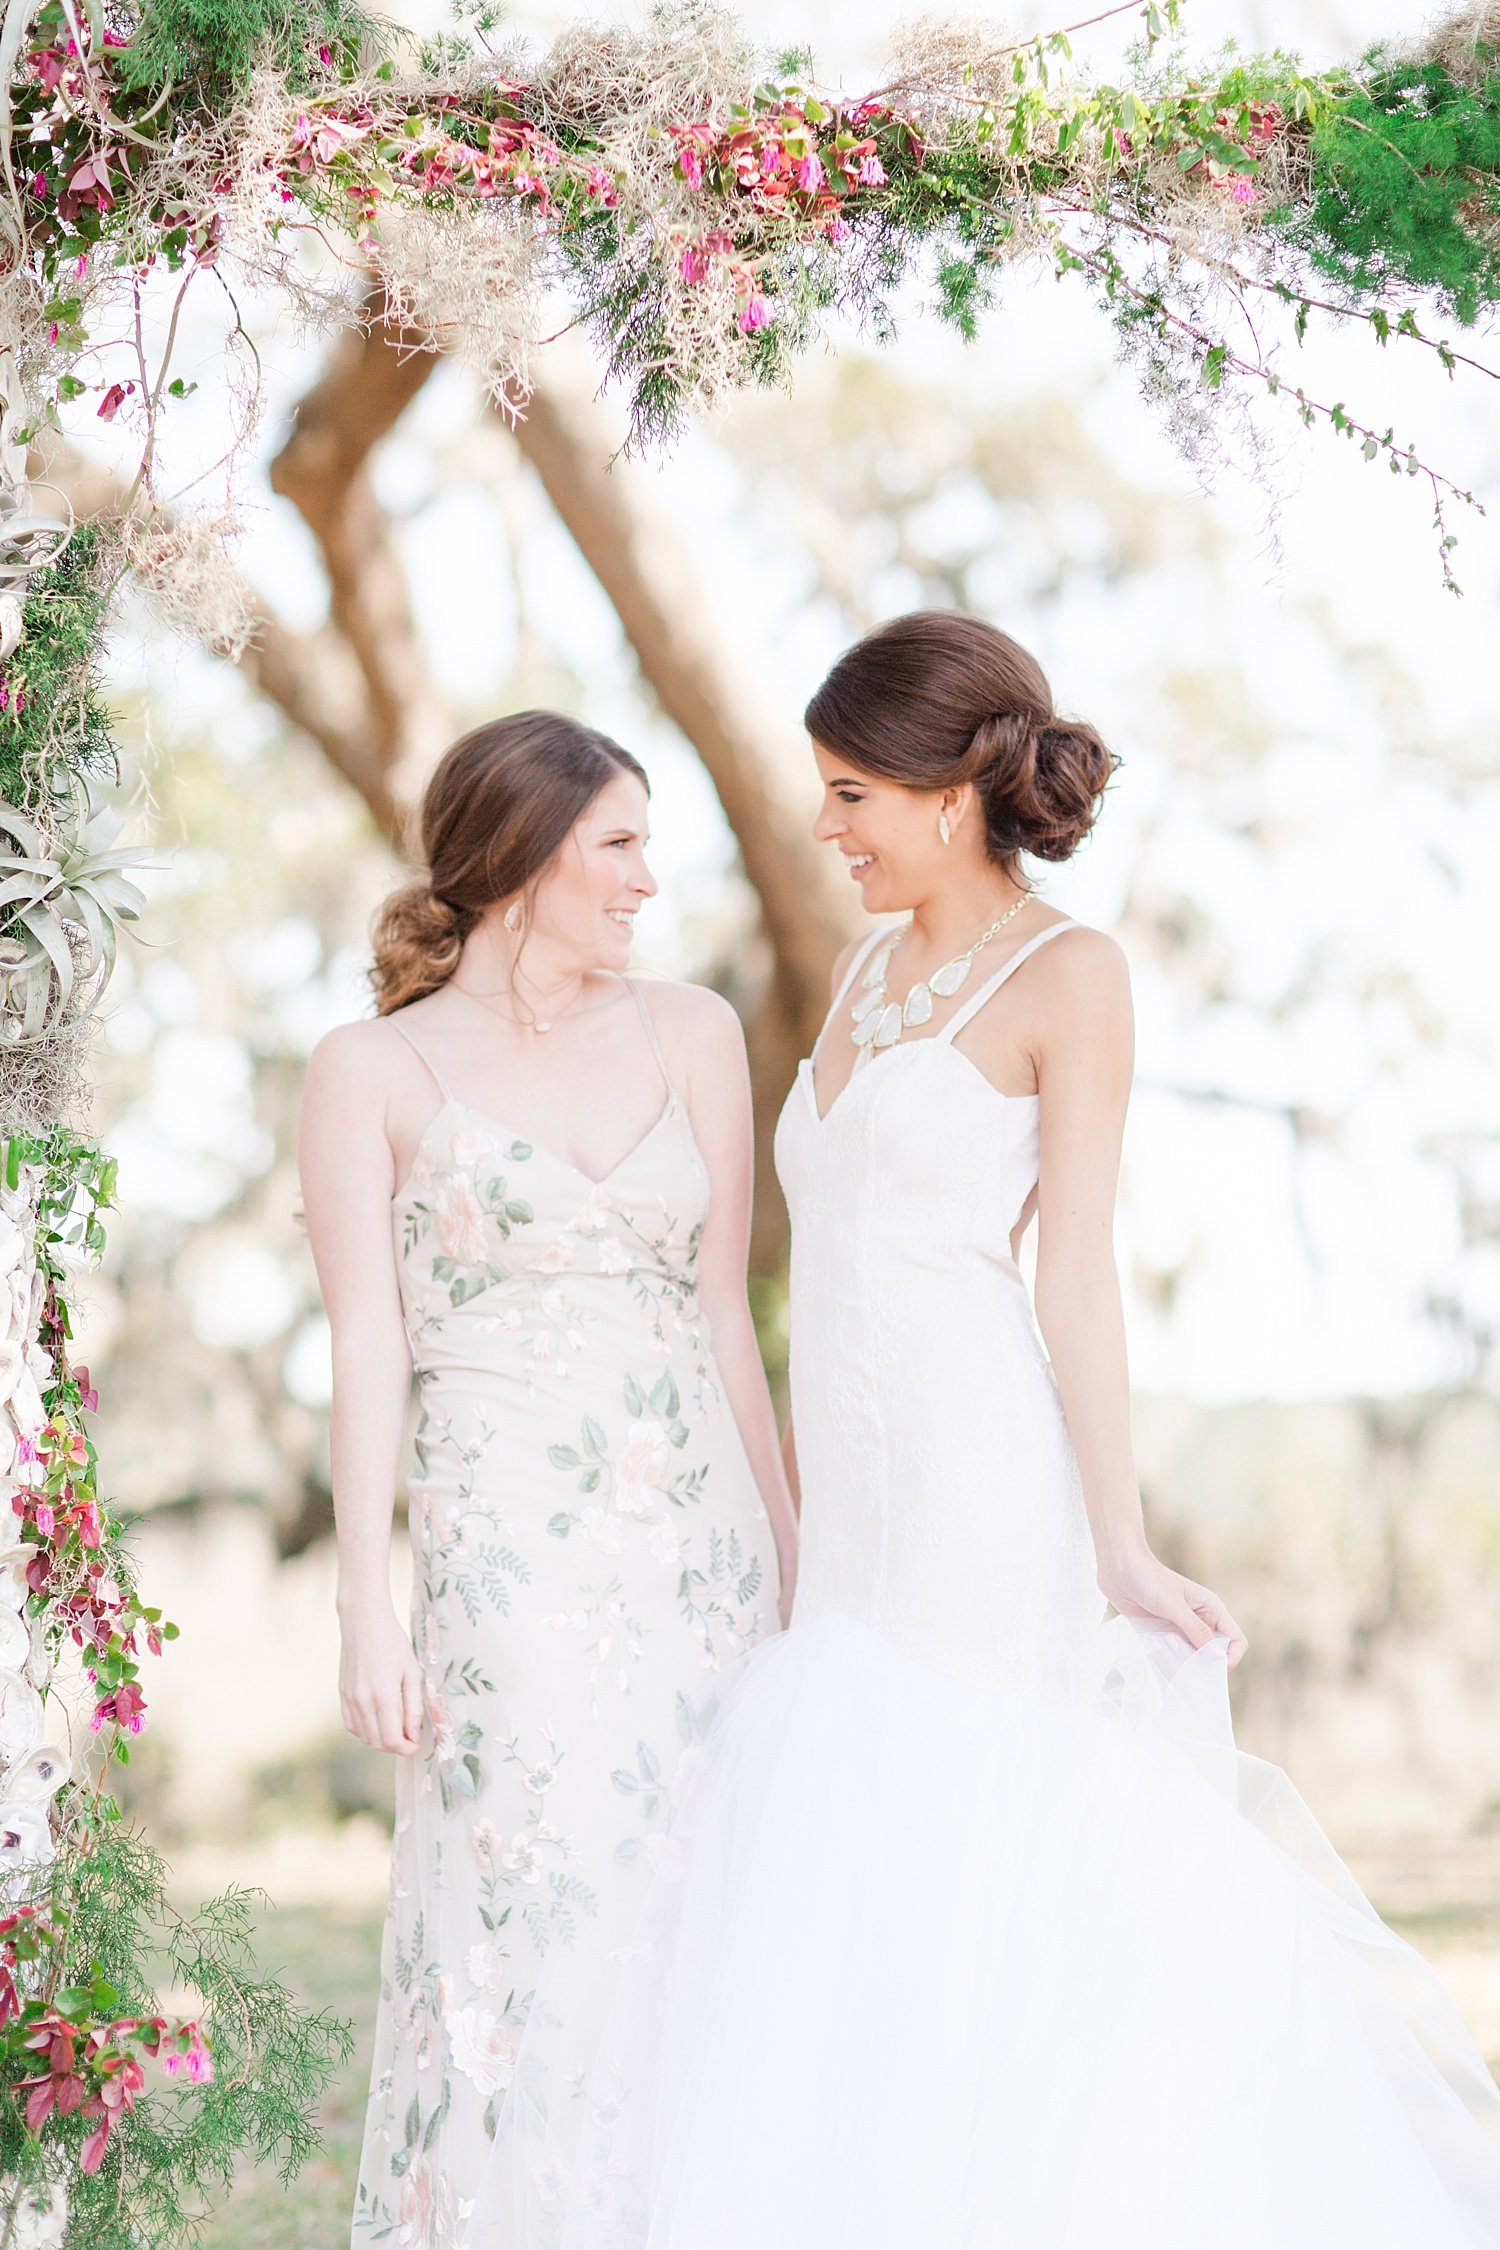 rachel-strickland-photography-katie-may-ivory-and-beau-bridal-boutique-bethesda-academy-wedding-whitfield-chapel-wedding-savannah-bridal-boutique-savannah-weddings-savannah-wedding-savannah-wedding-planner-savannah-bridal-gowns-savannah-bride-16.jpg